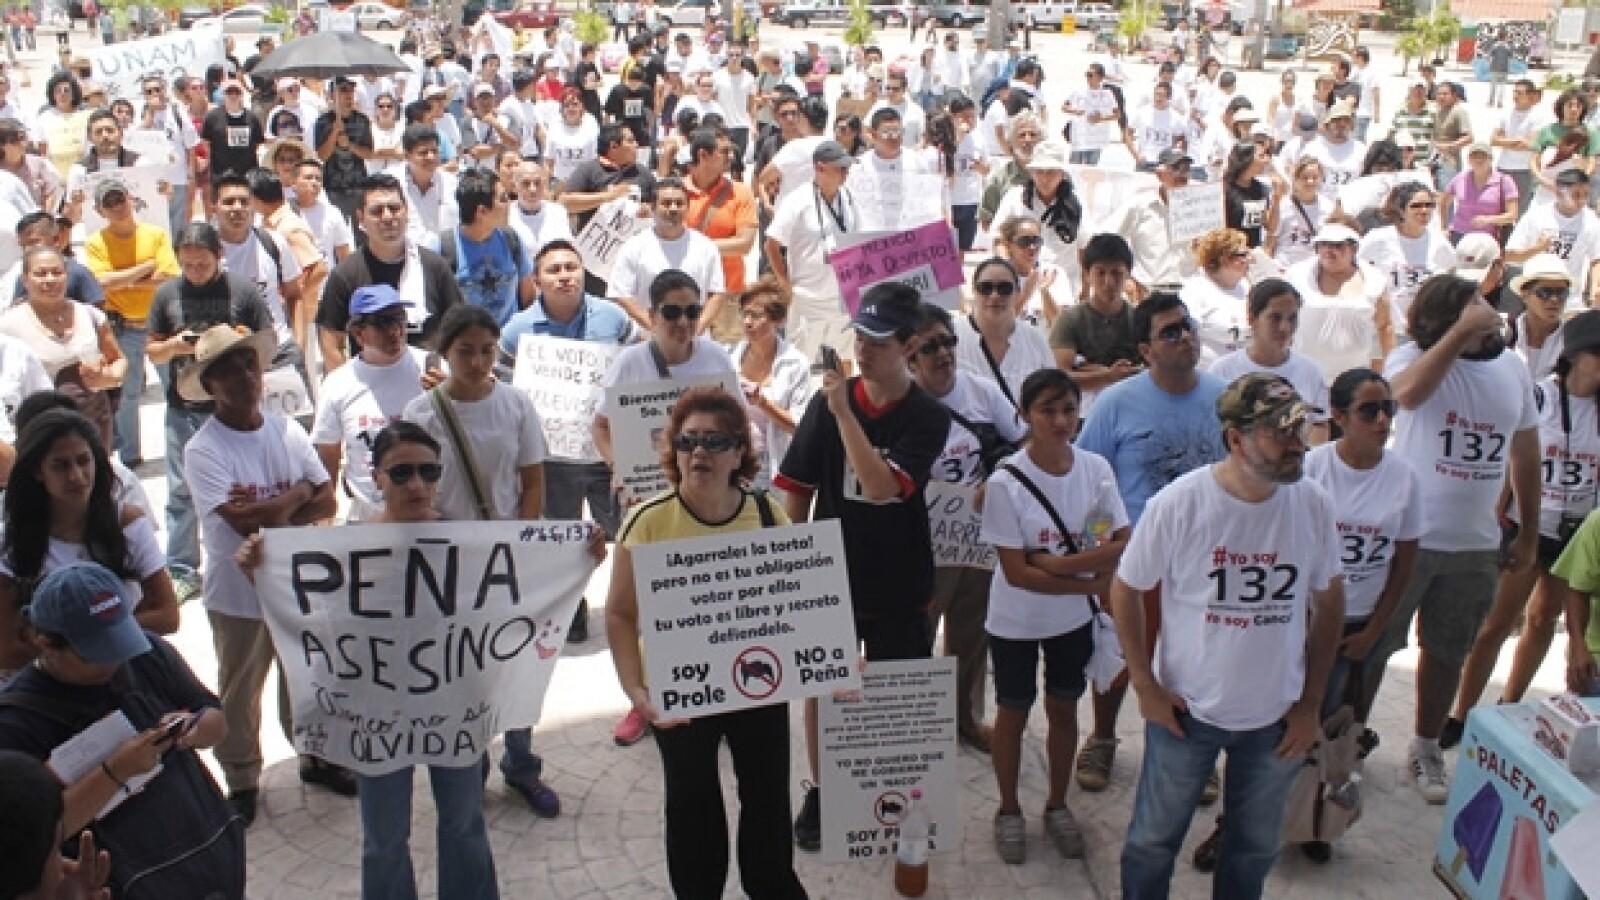 marcha anti peña en cancún